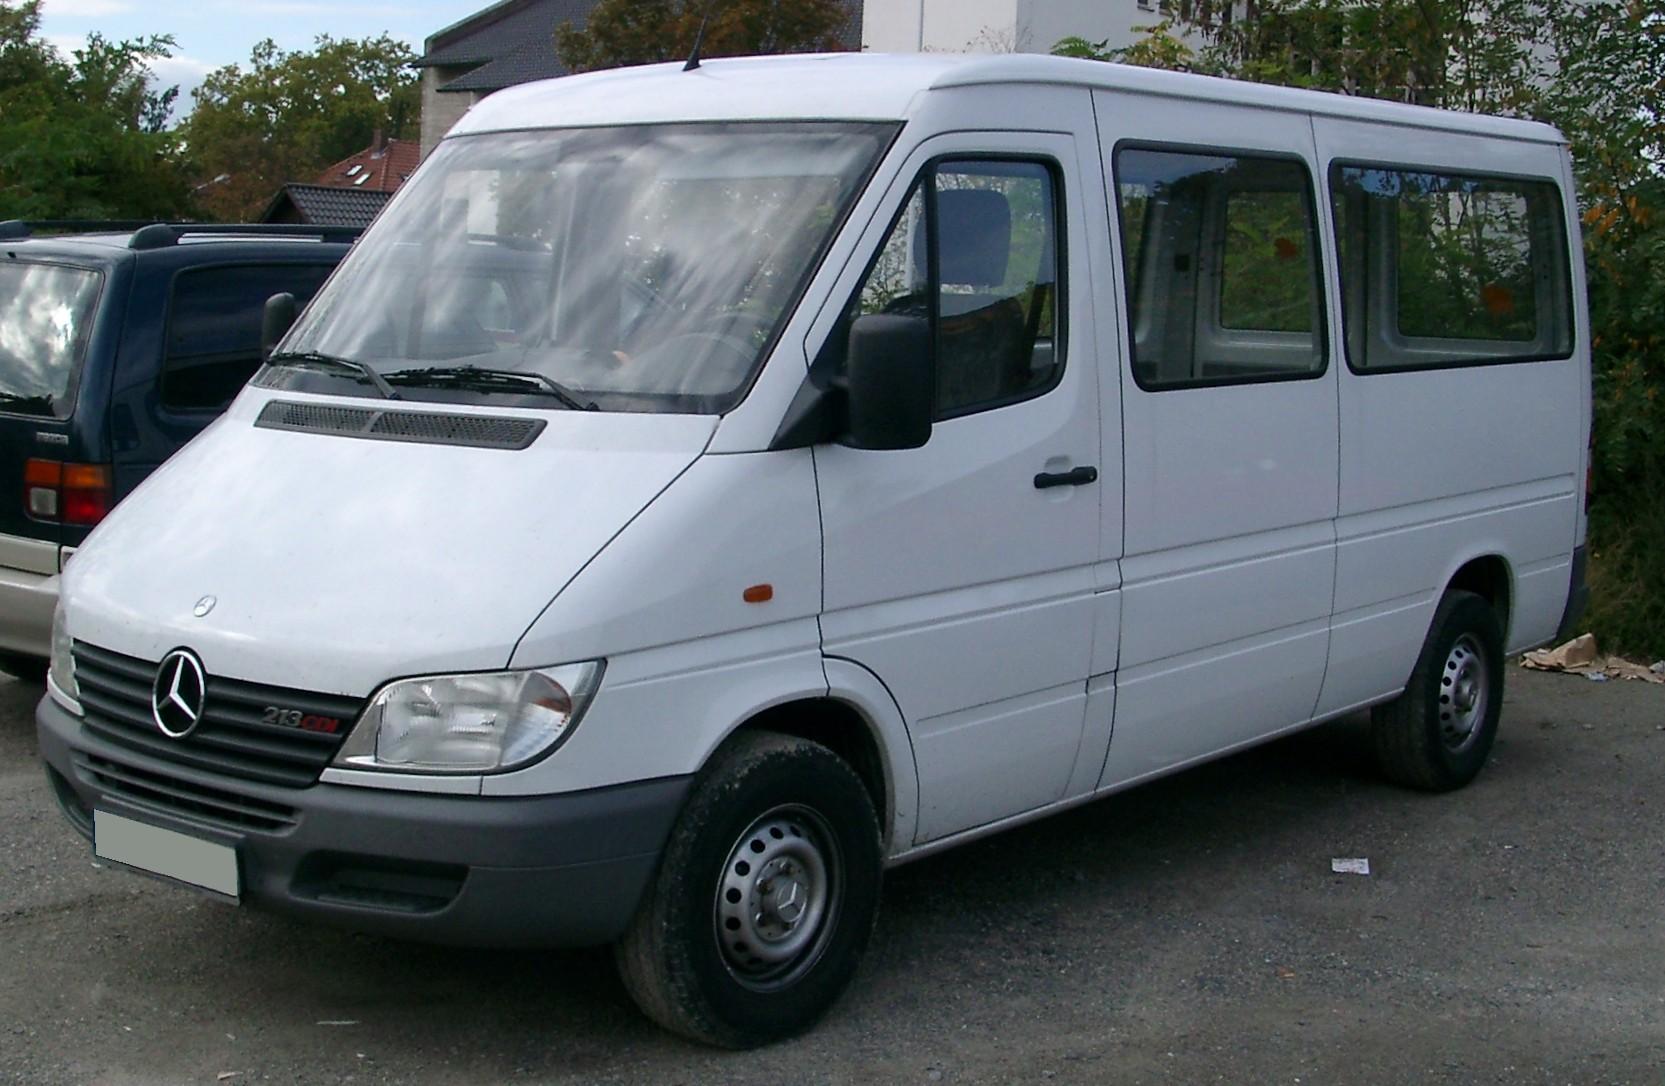 Mercedes Benz Van >> File:Mercedes Sprinter front 20070926.jpg - Wikimedia Commons